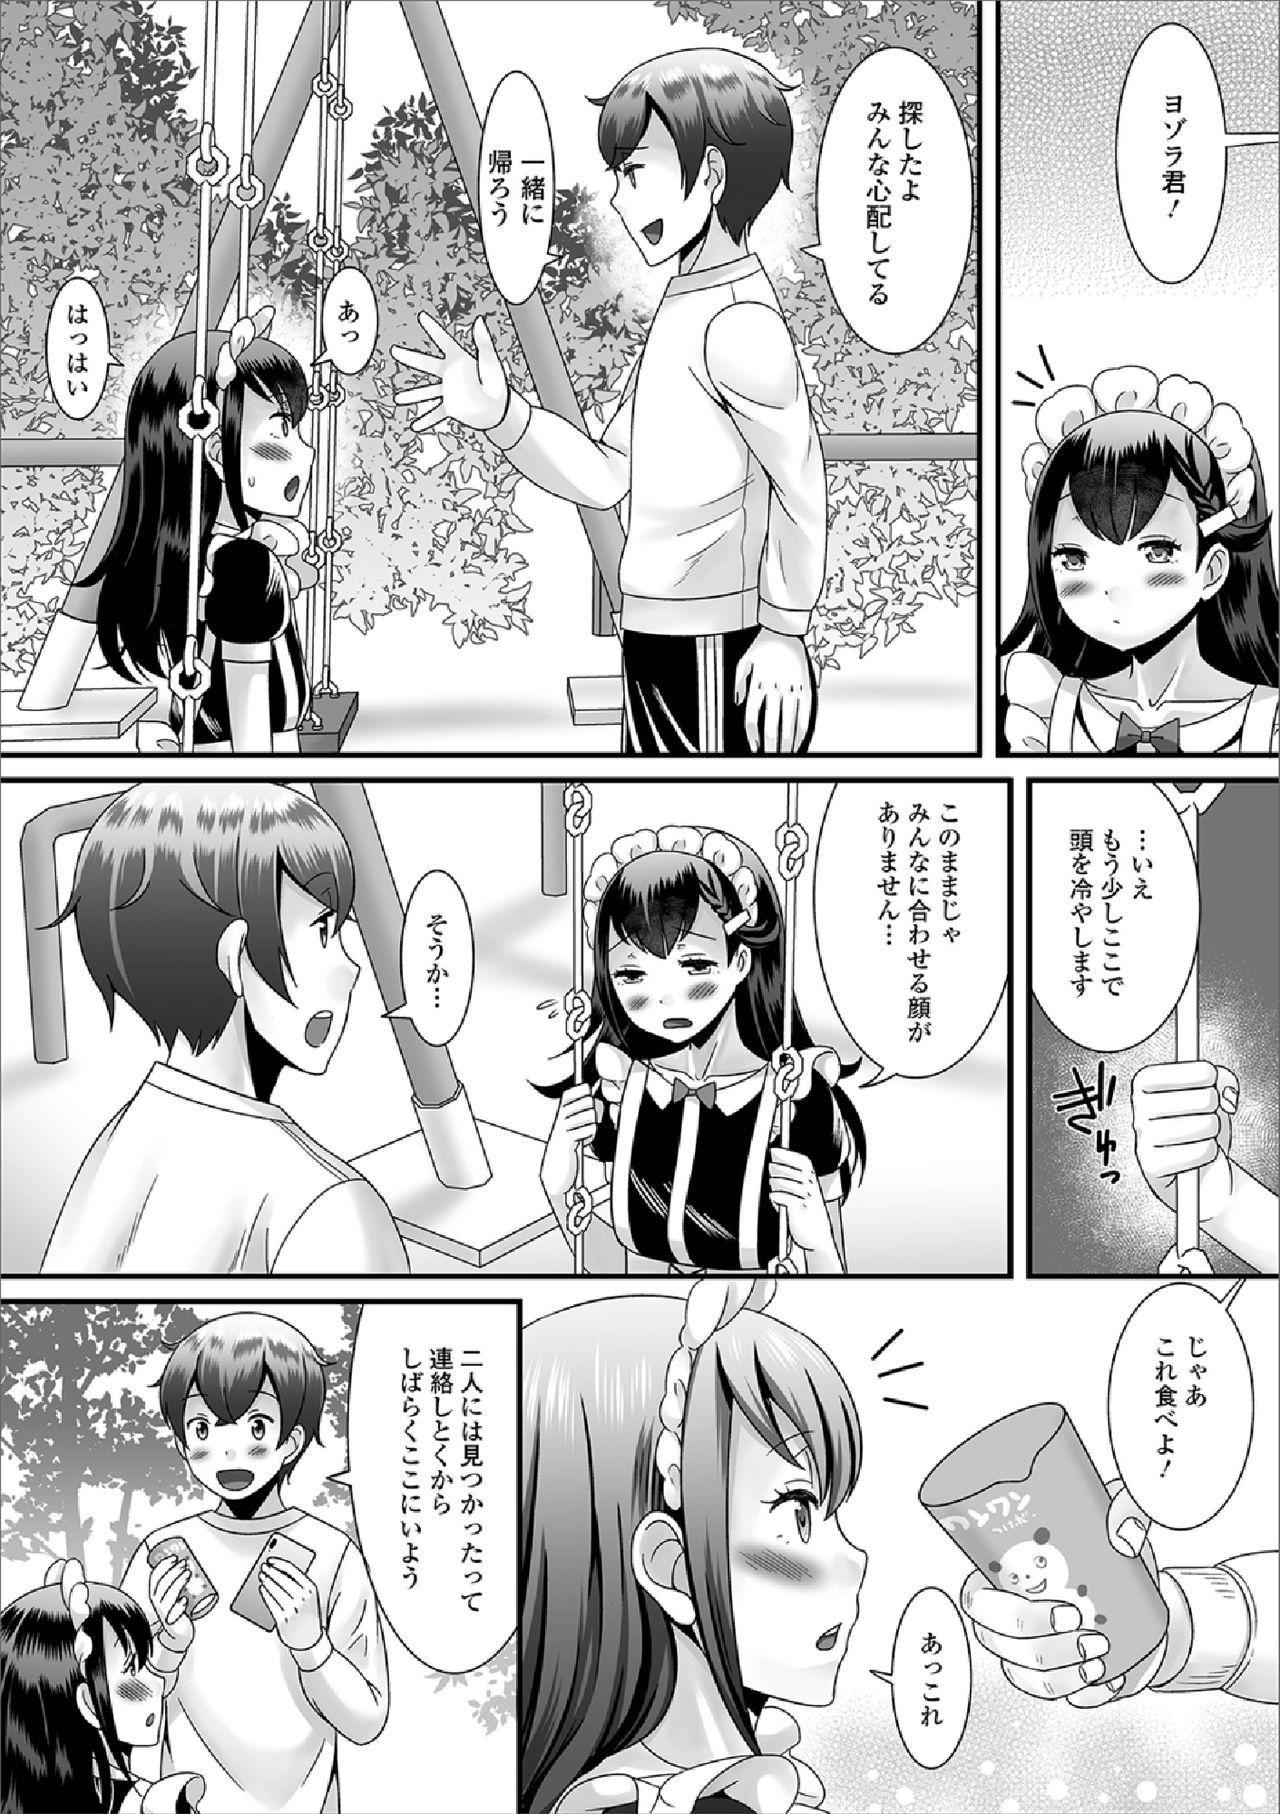 Gekkan Web Otoko no Ko-llection! S Vol. 38 4